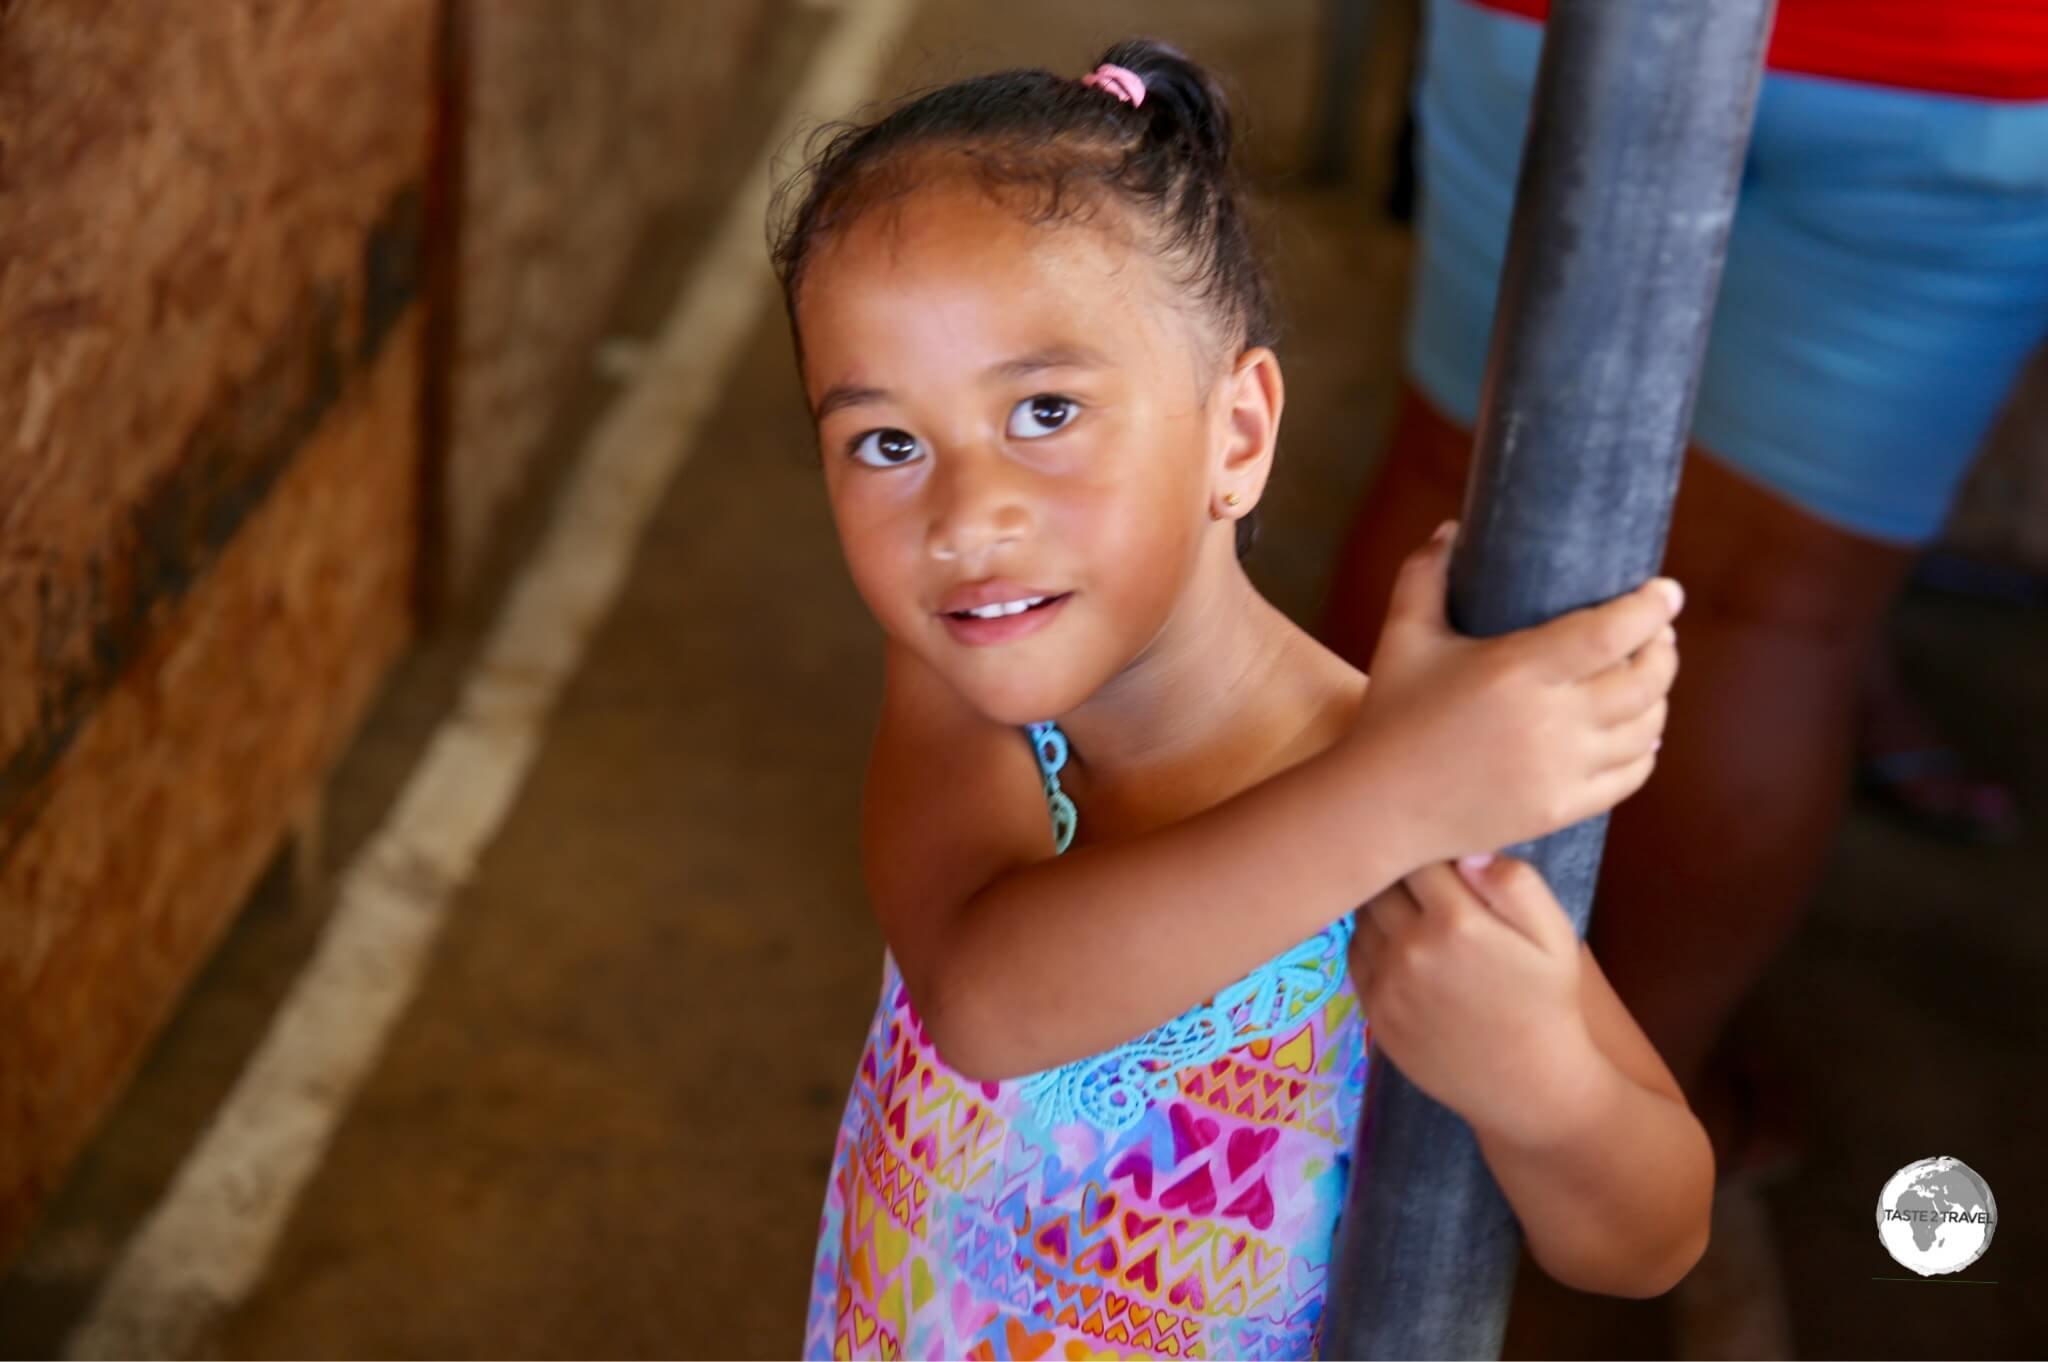 The daughter of a vendor at Talamahu market.